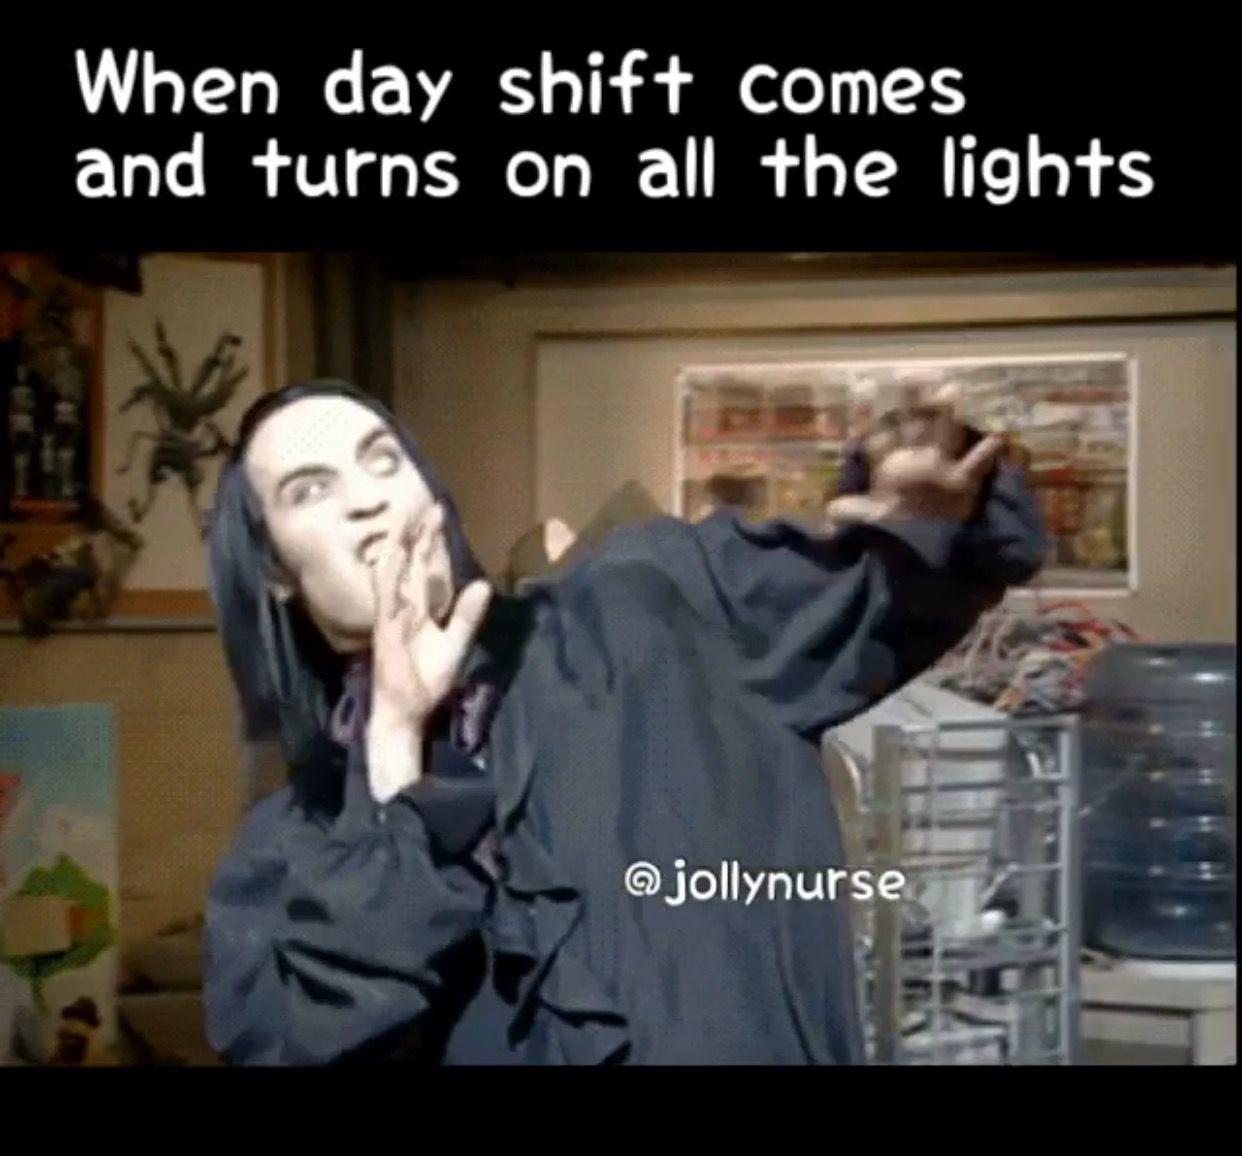 Omg Who Thought That Was A Good Idea Nightshiftproblems Night Nurse Humor Medical Humor Night Shift Nurse Humor